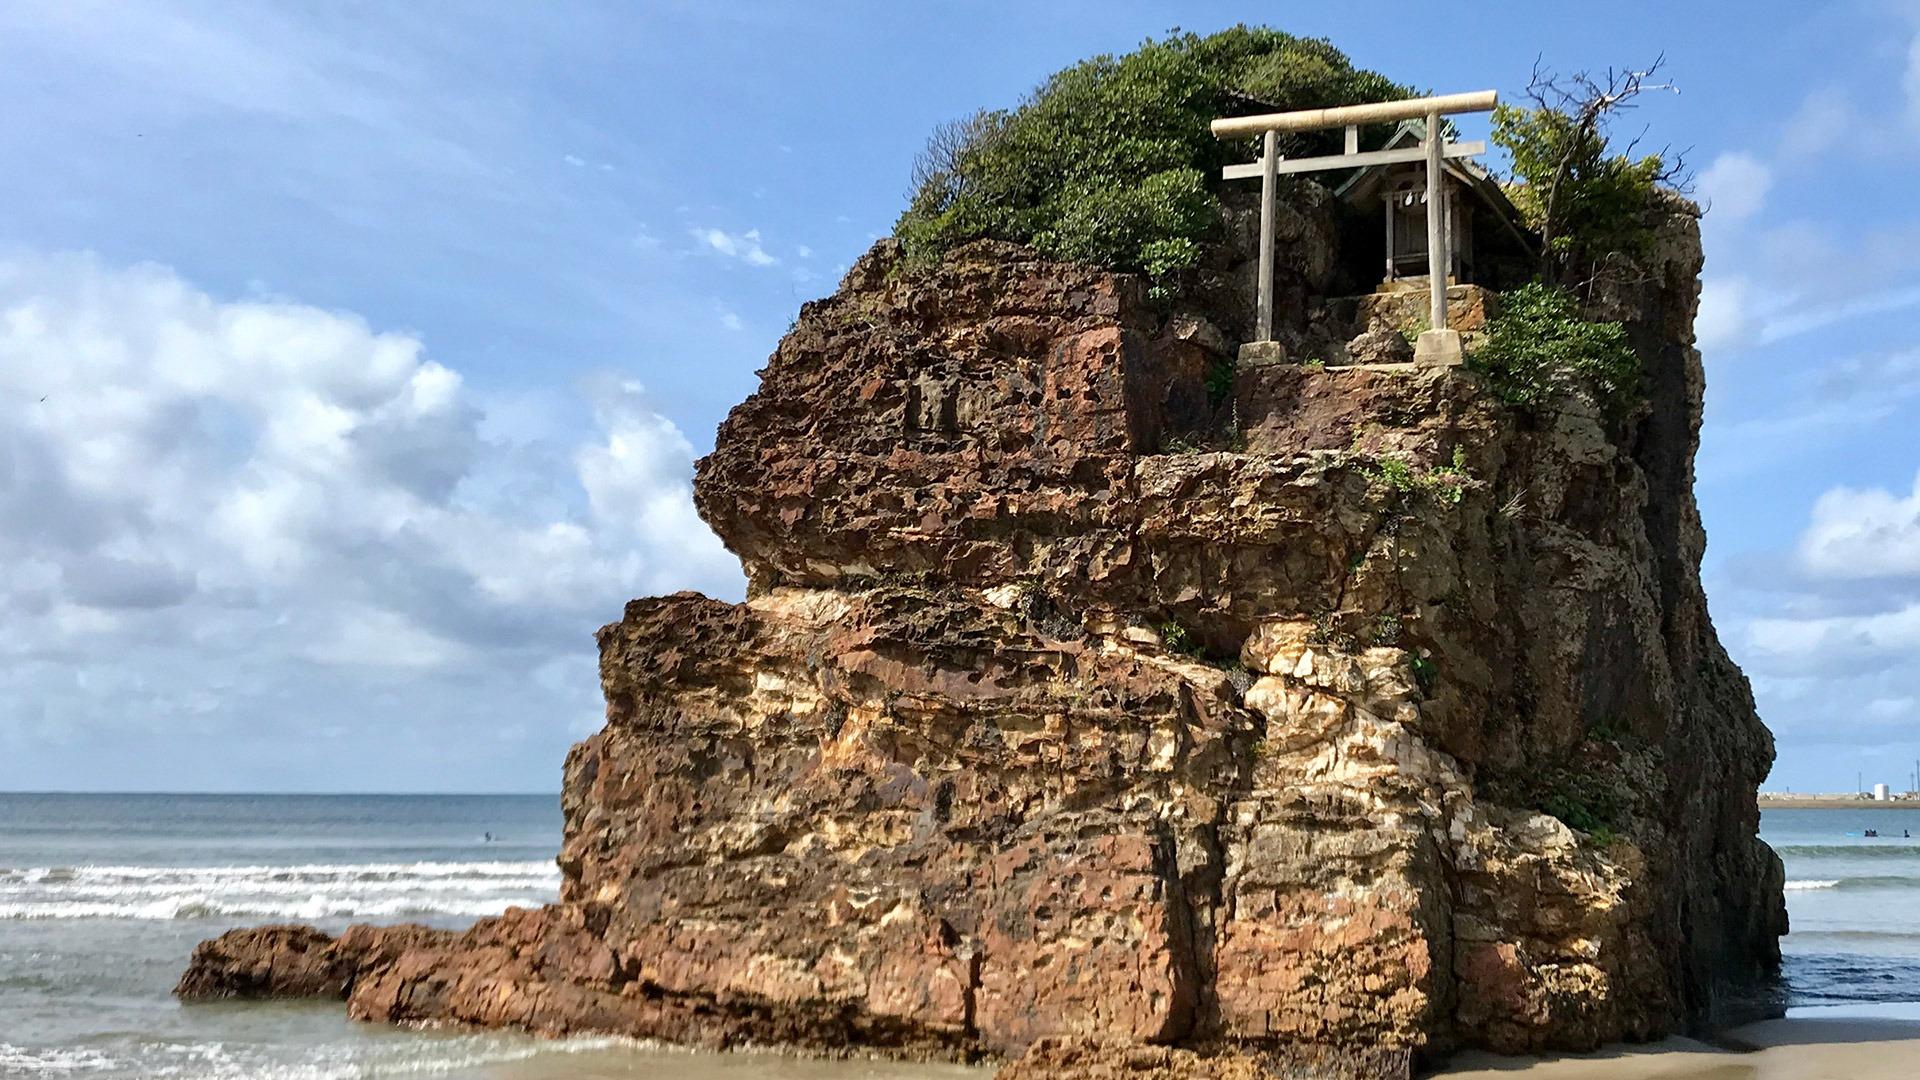 Seaside Benten-jima Shrine in Izumo, Japan